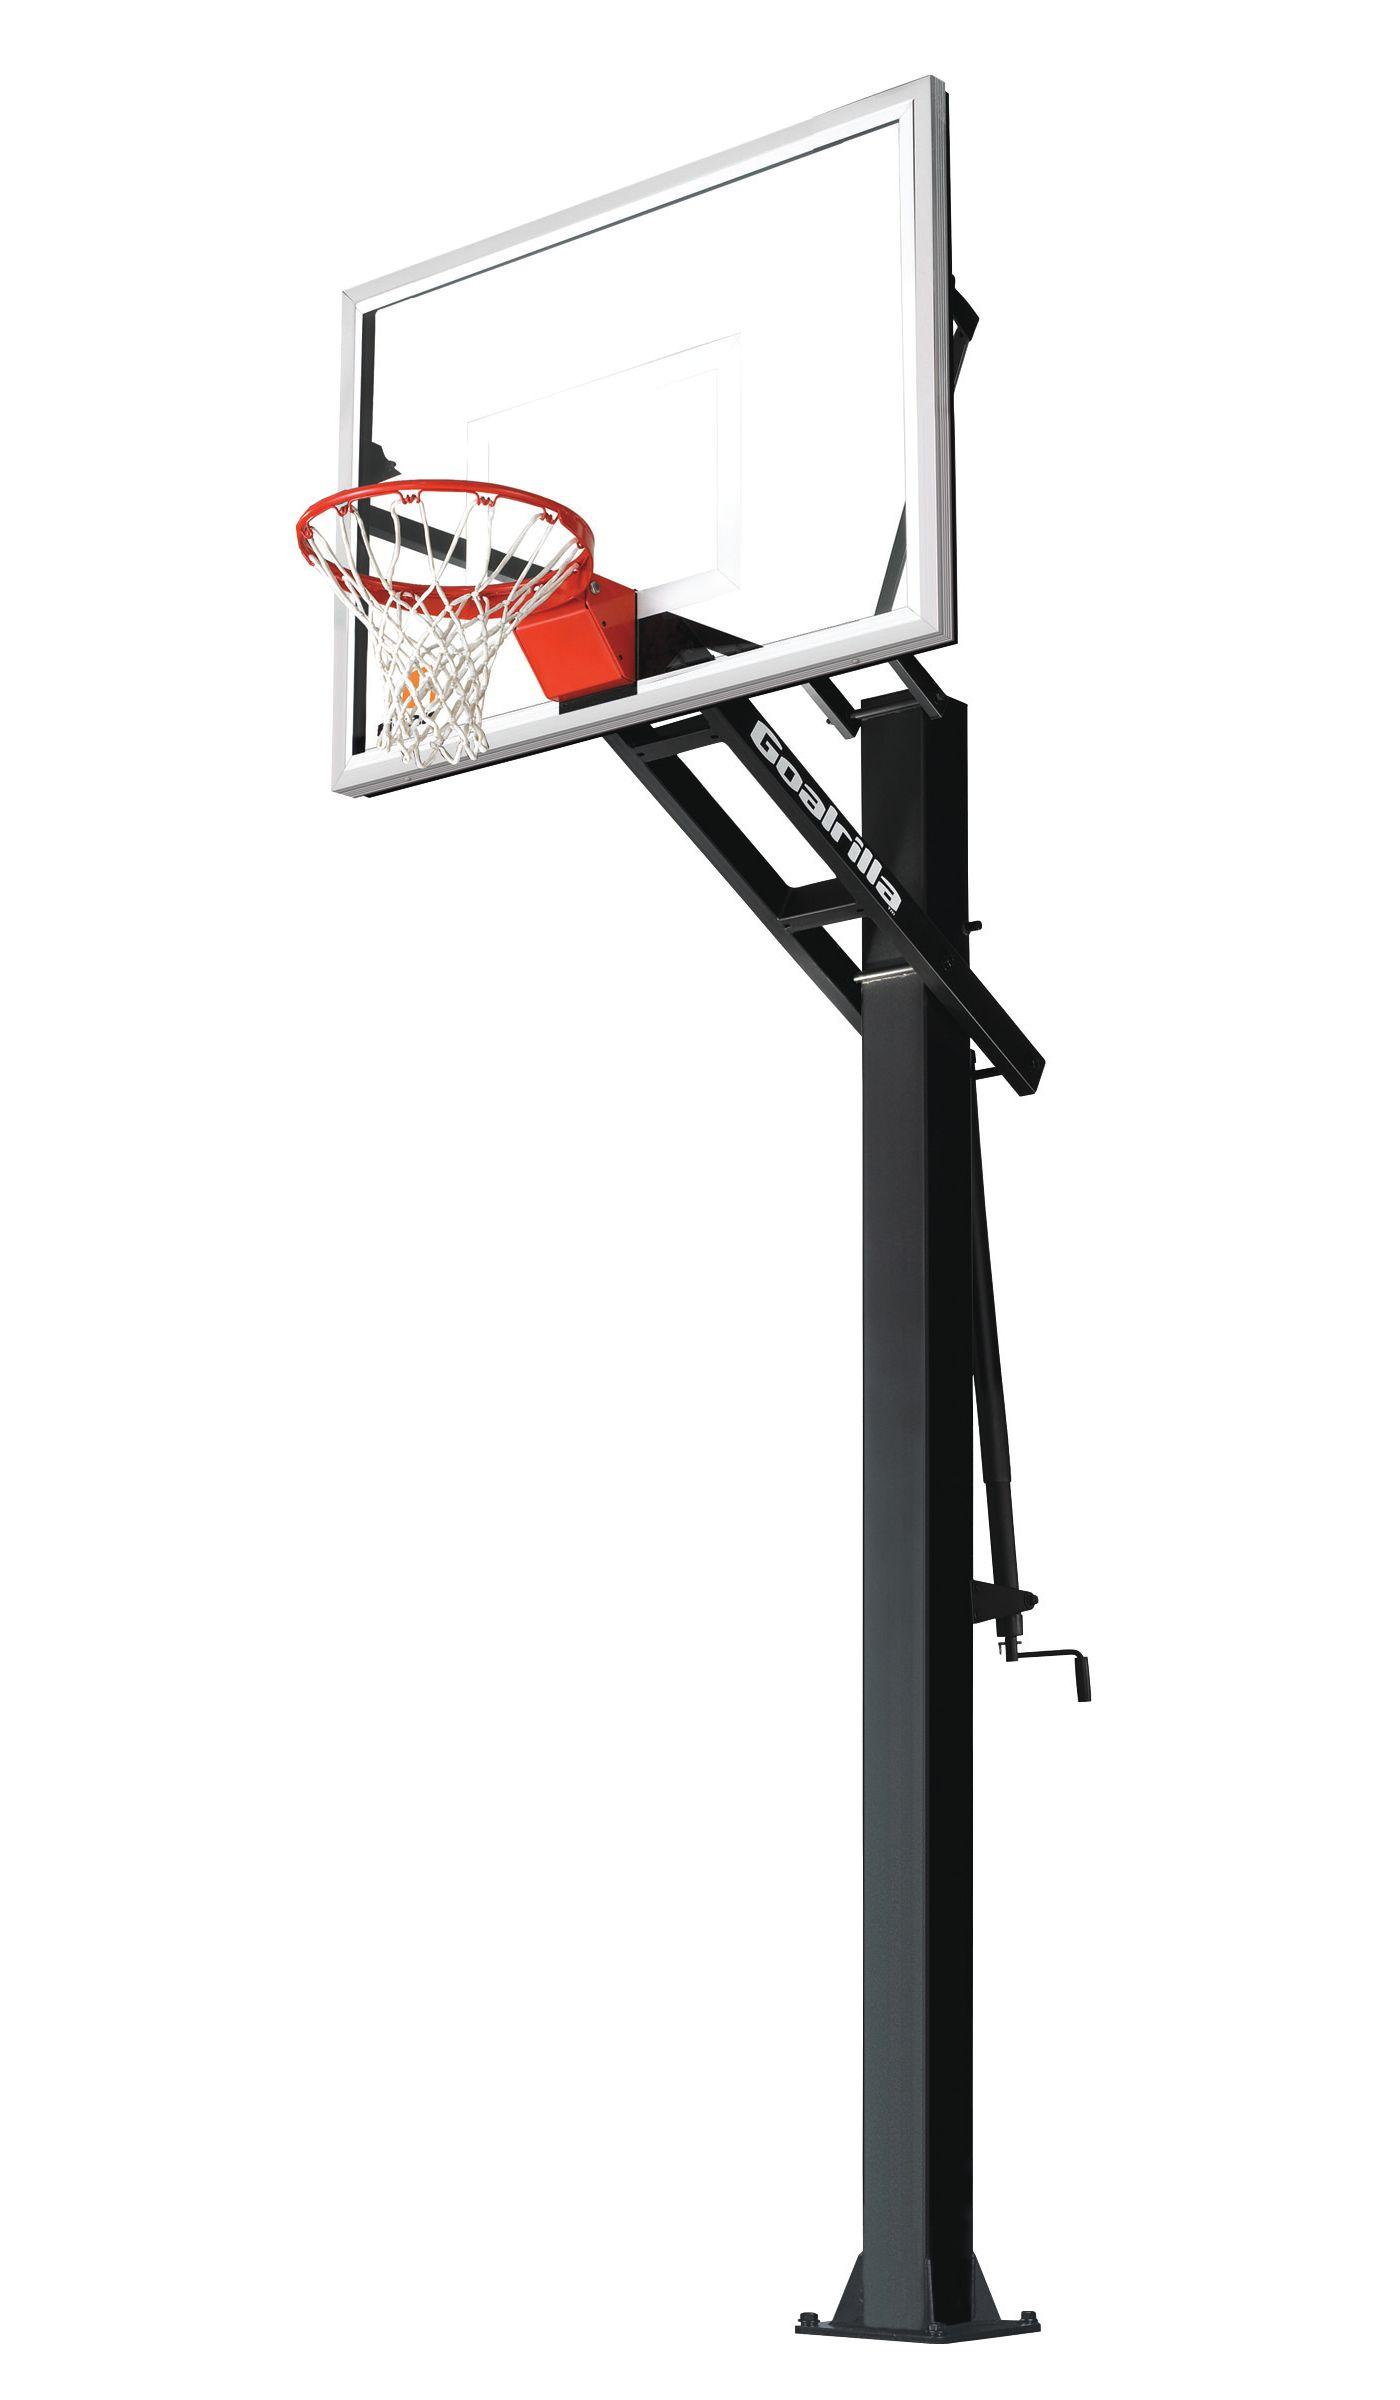 Goalrilla 54'' In-Ground Basketball Hoop